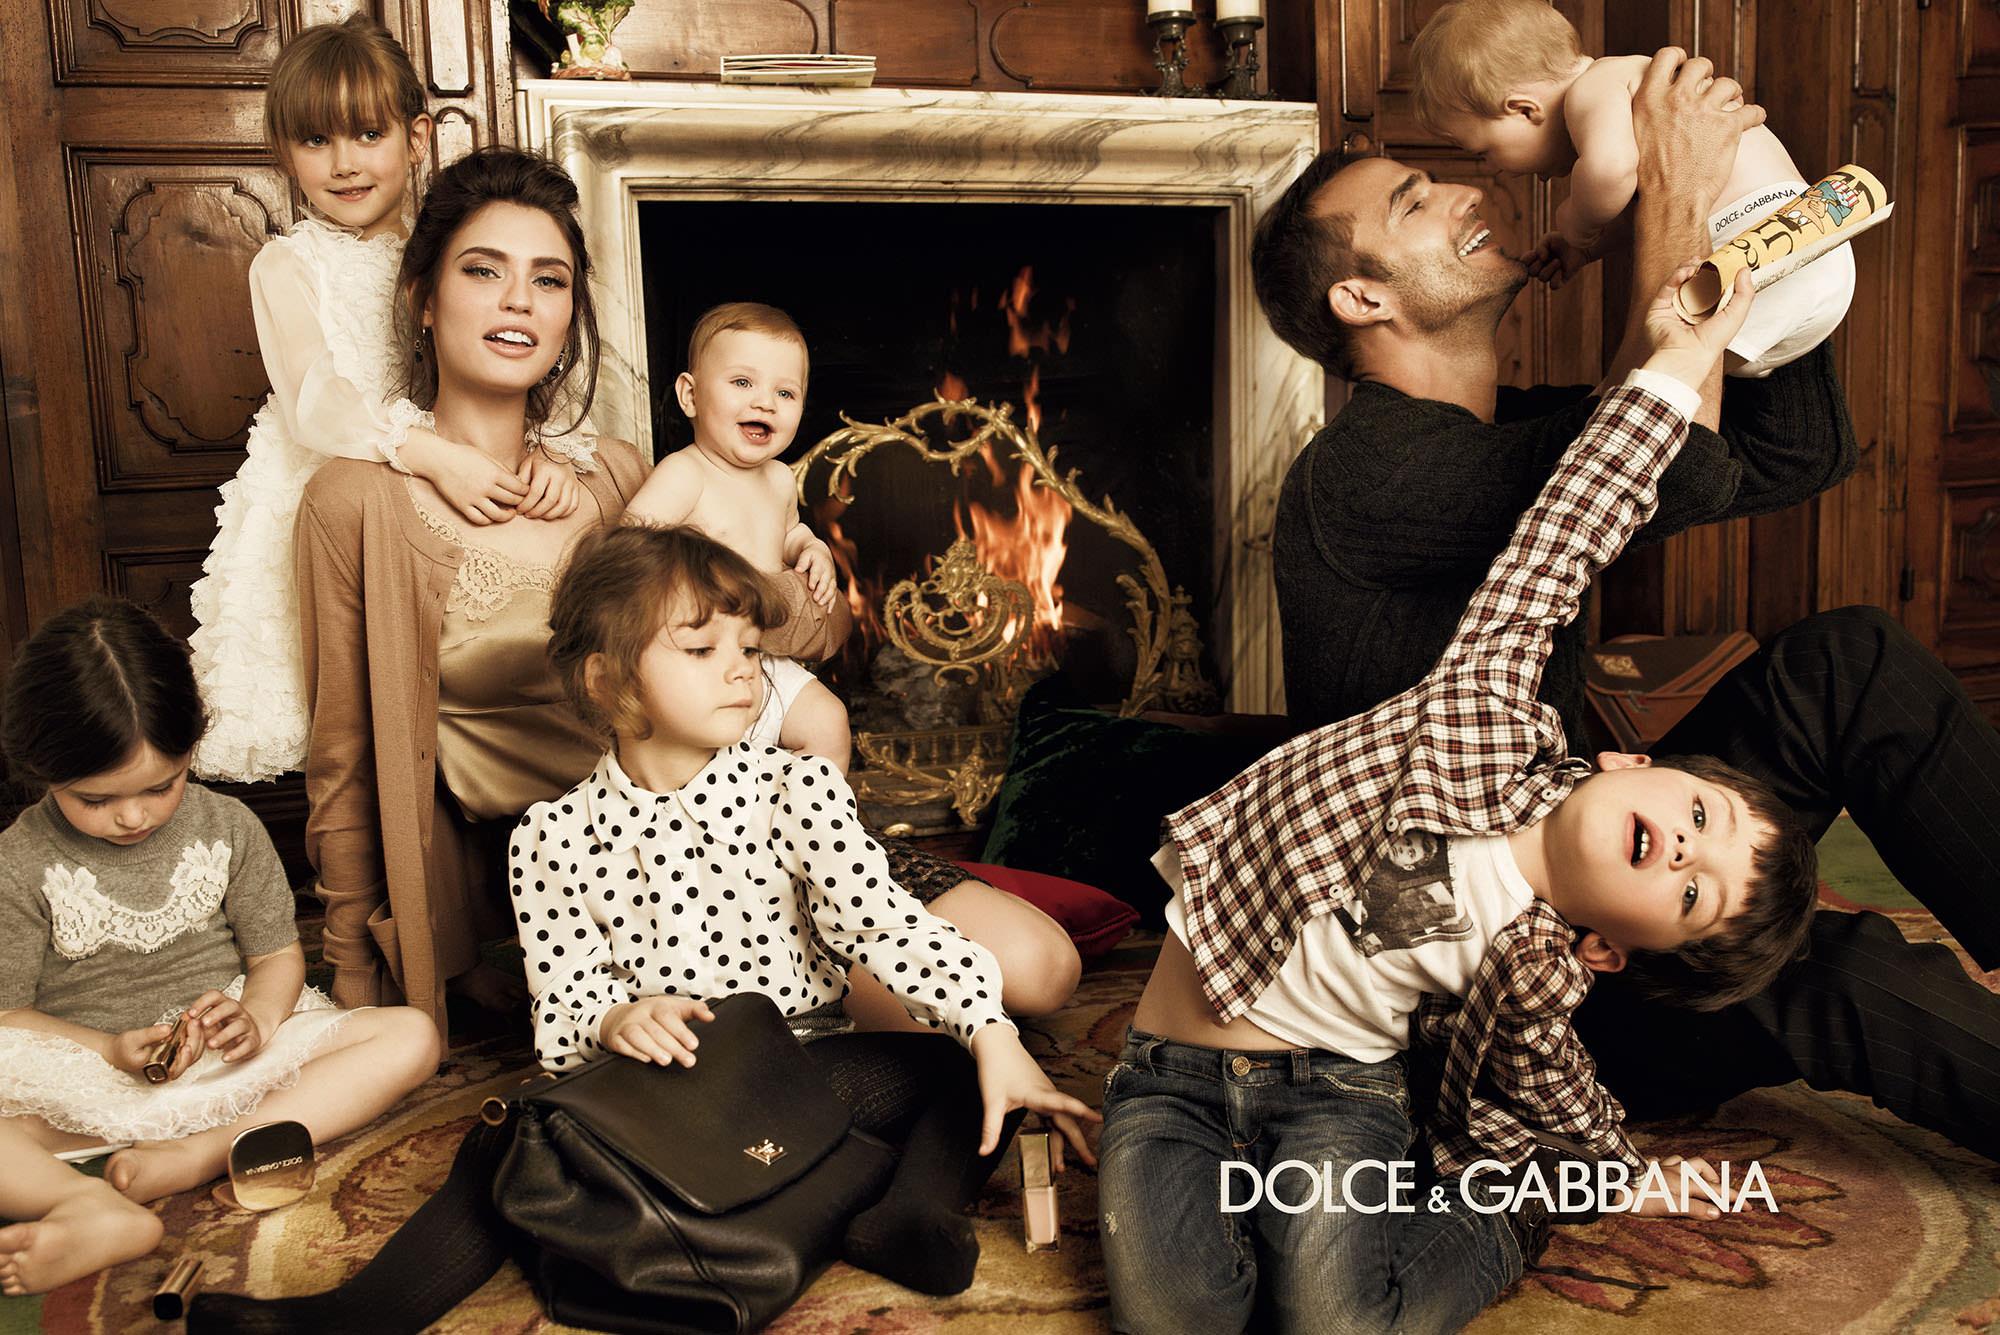 dolce-gabbana-baby2.jpg.989f1ba1867231b99cf0f900ec6e1536